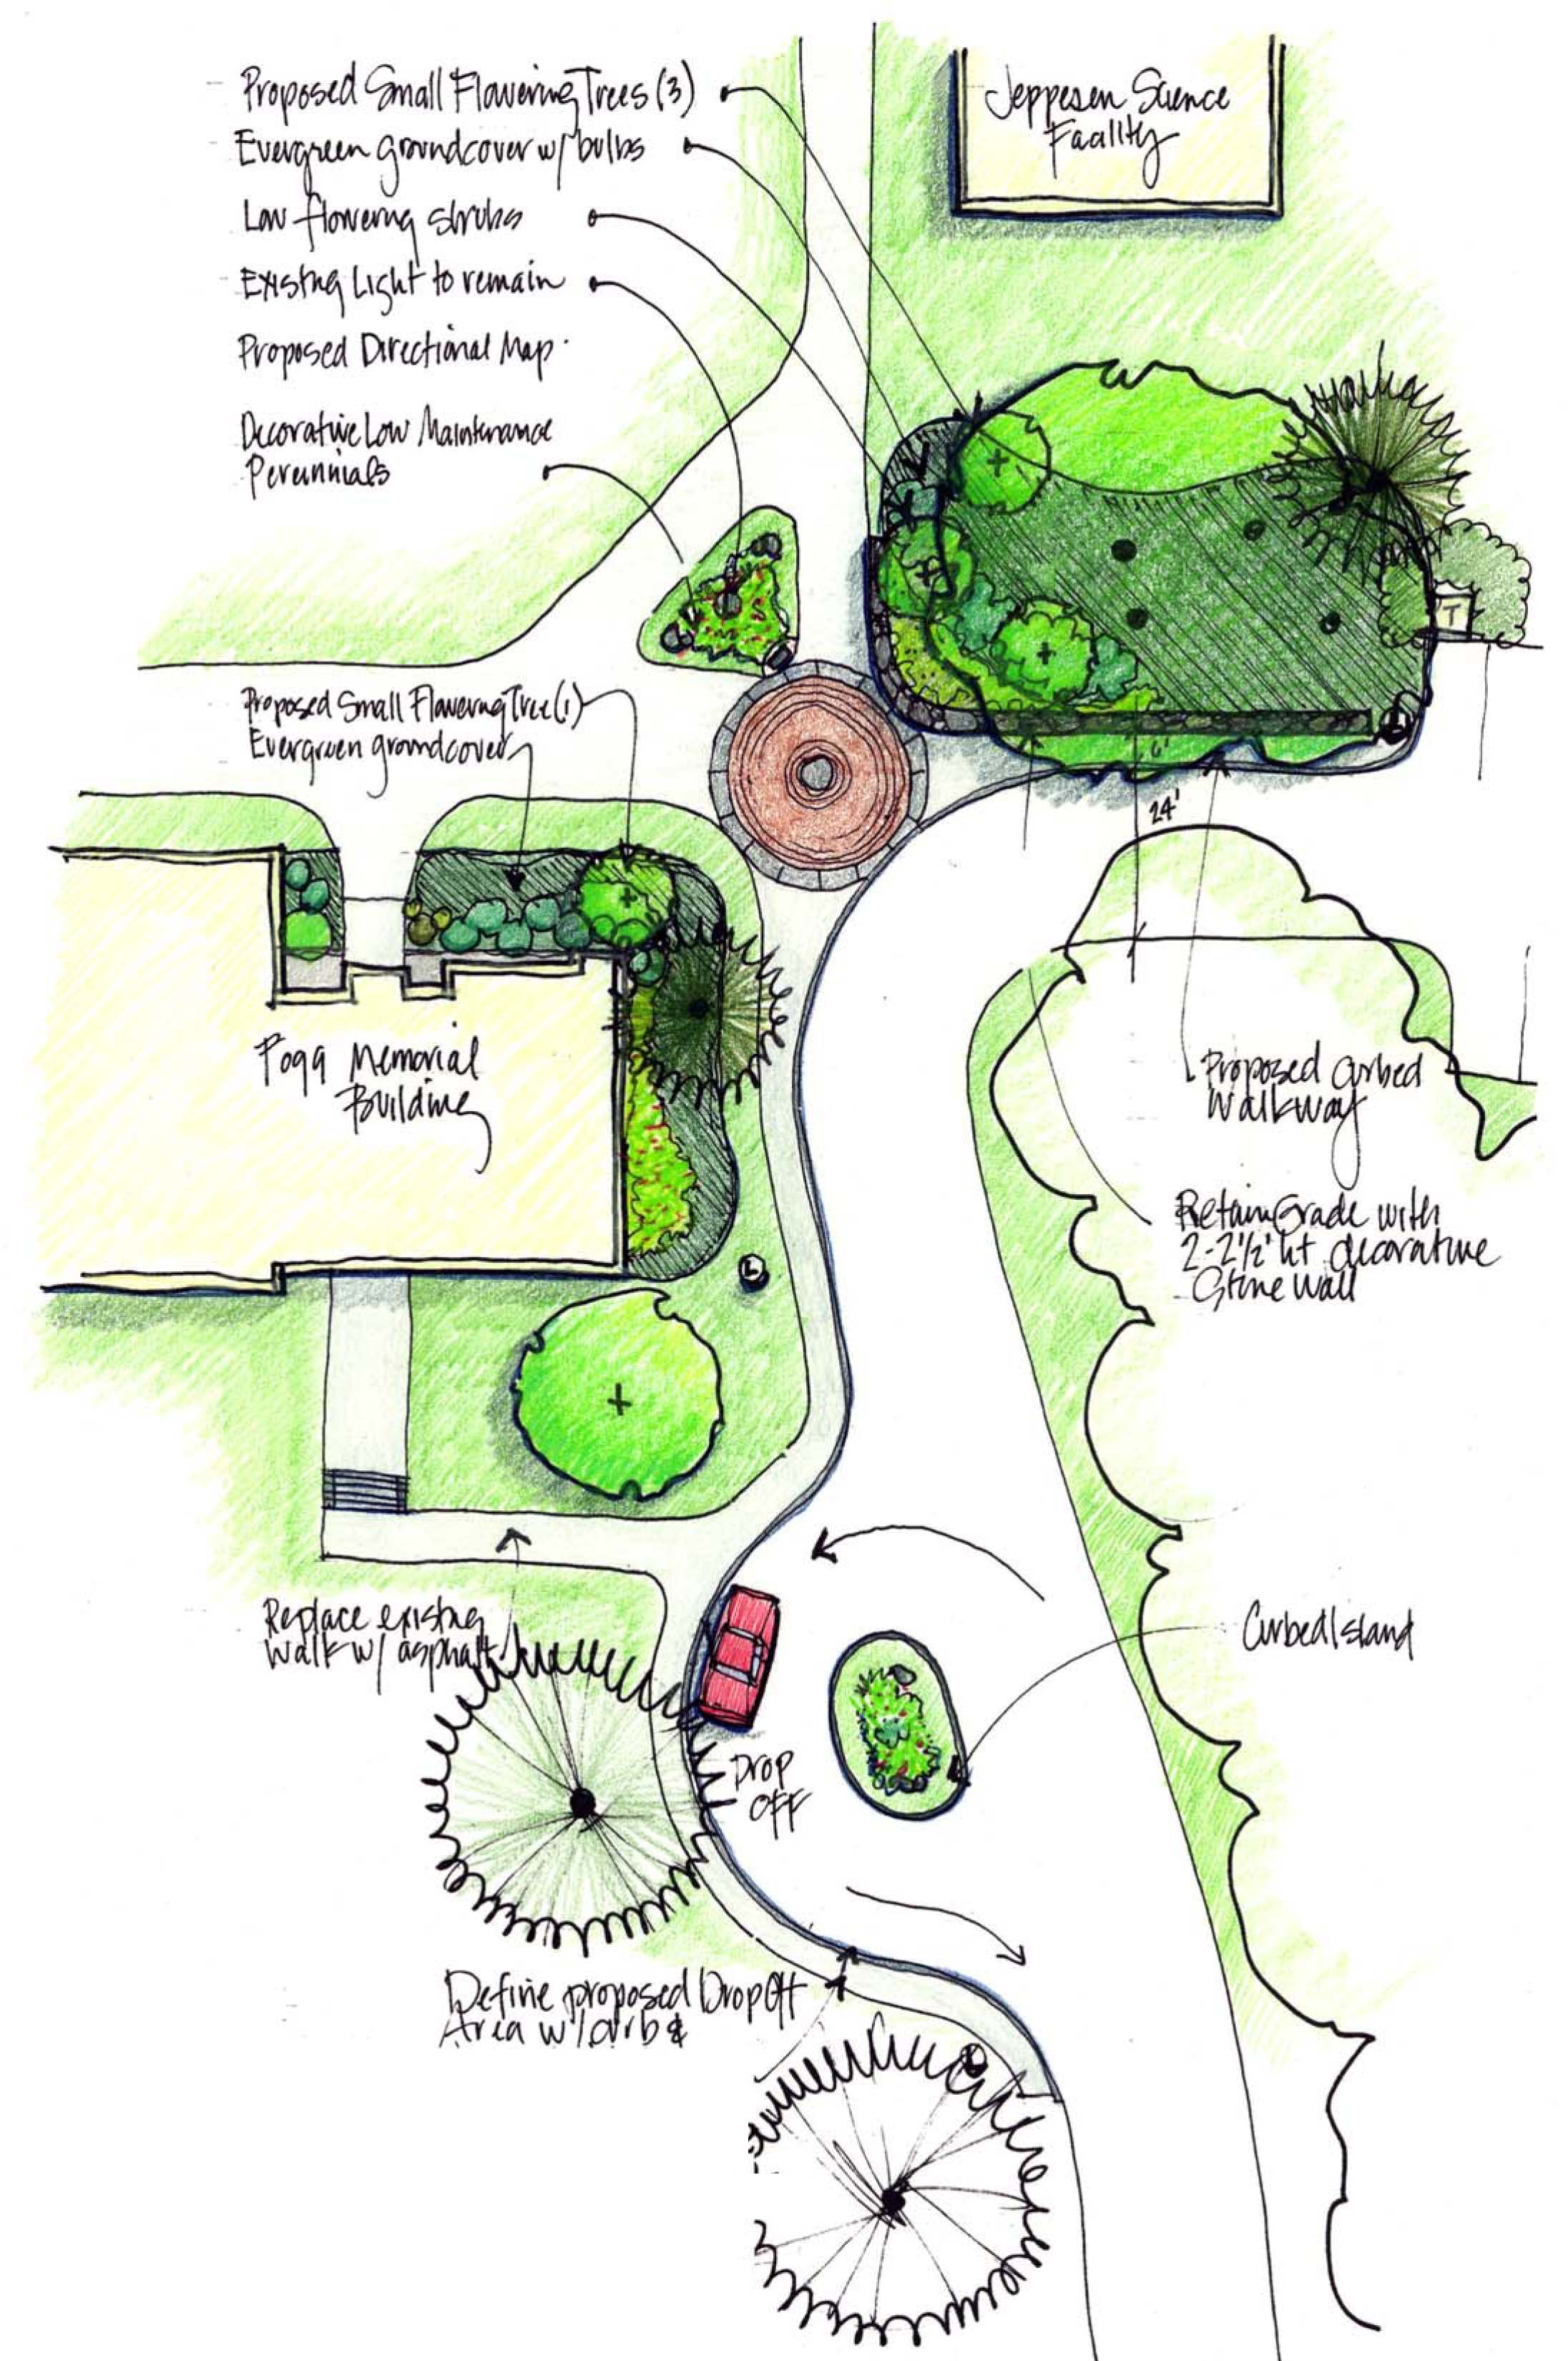 South Entry Landscape Plan color.jpg